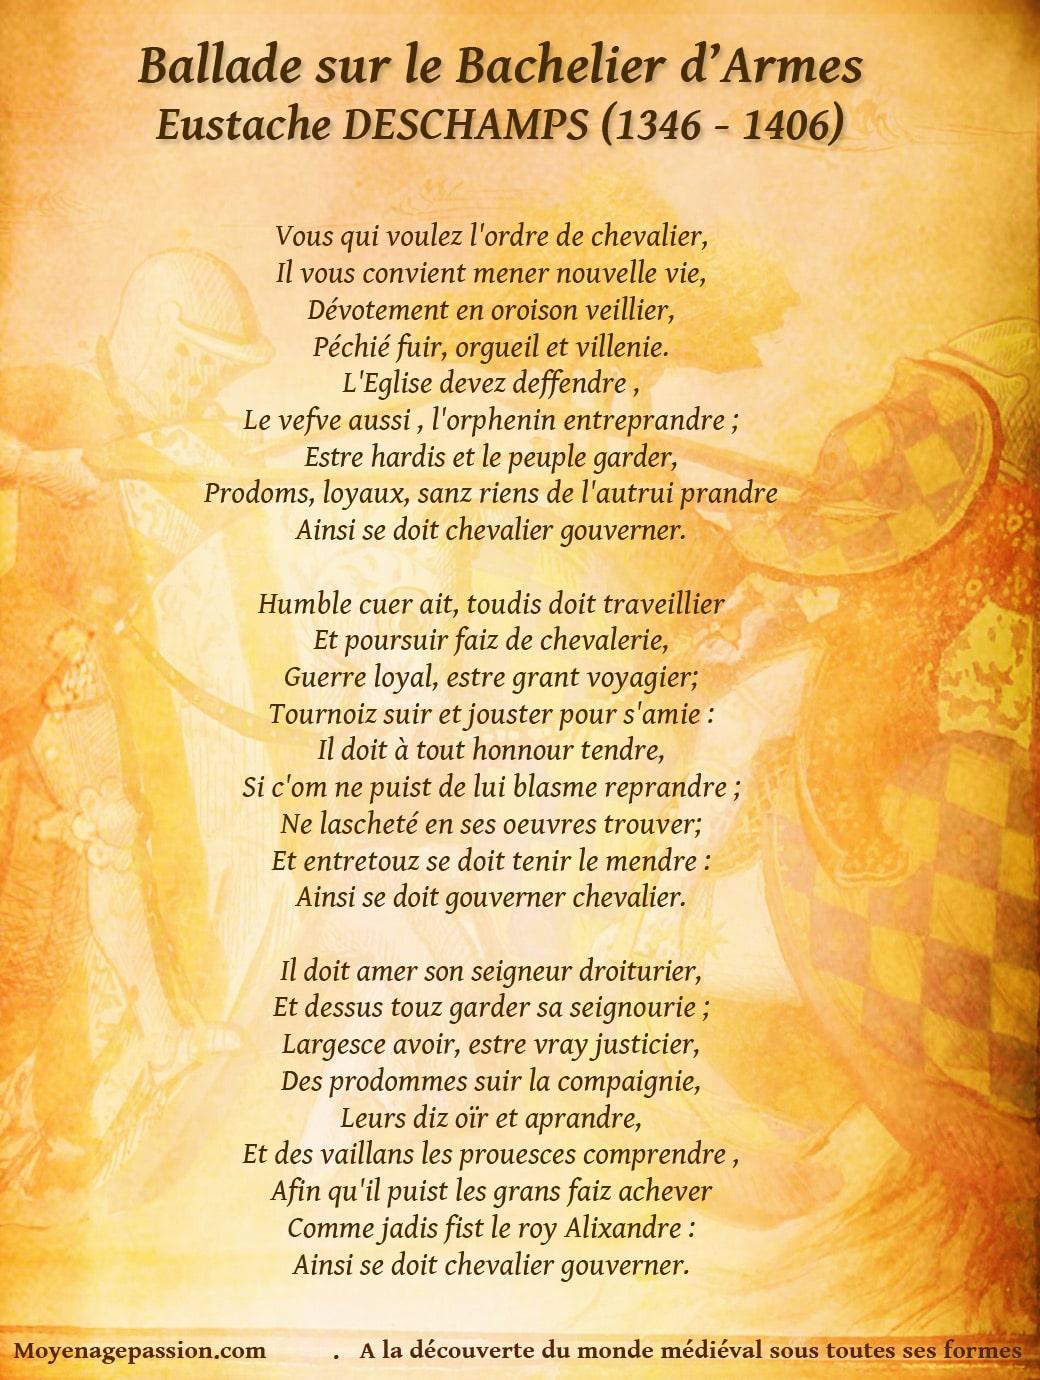 eustache_deschamps_poesie_ballade_medievale_chevalier_valeur_chevalerie_bachelier_armes_moyen-age_tardif